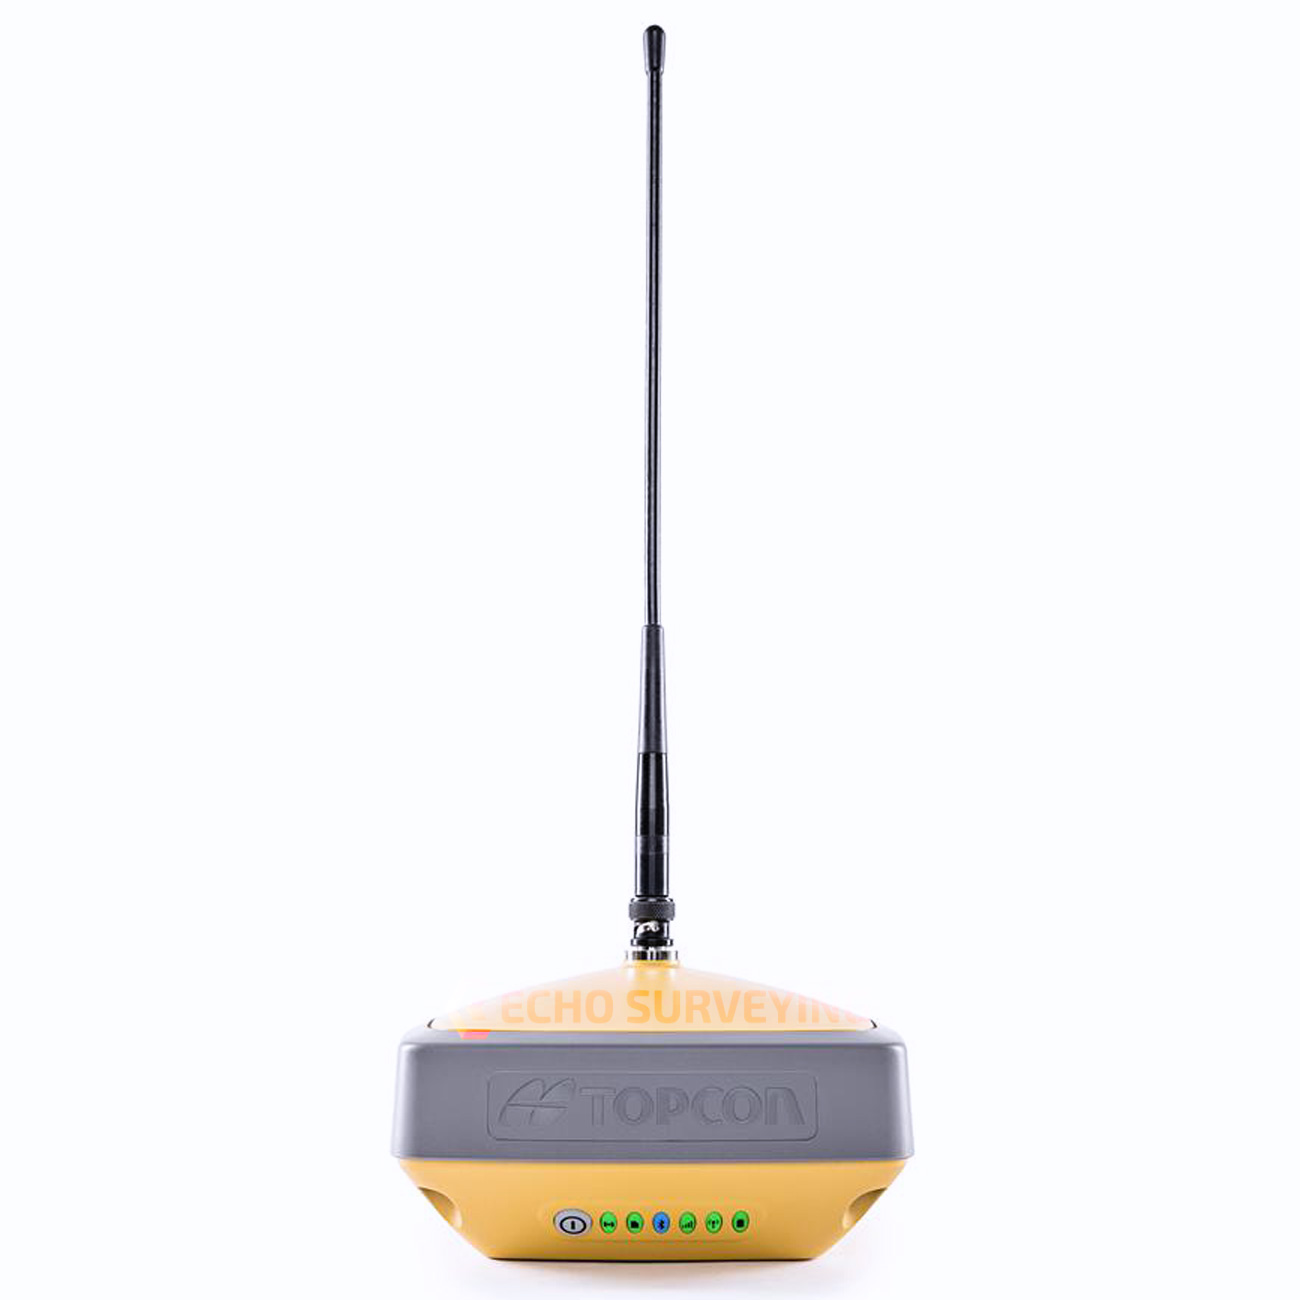 Topcon-Hiper-VR-GNSS-Receiver.jpg